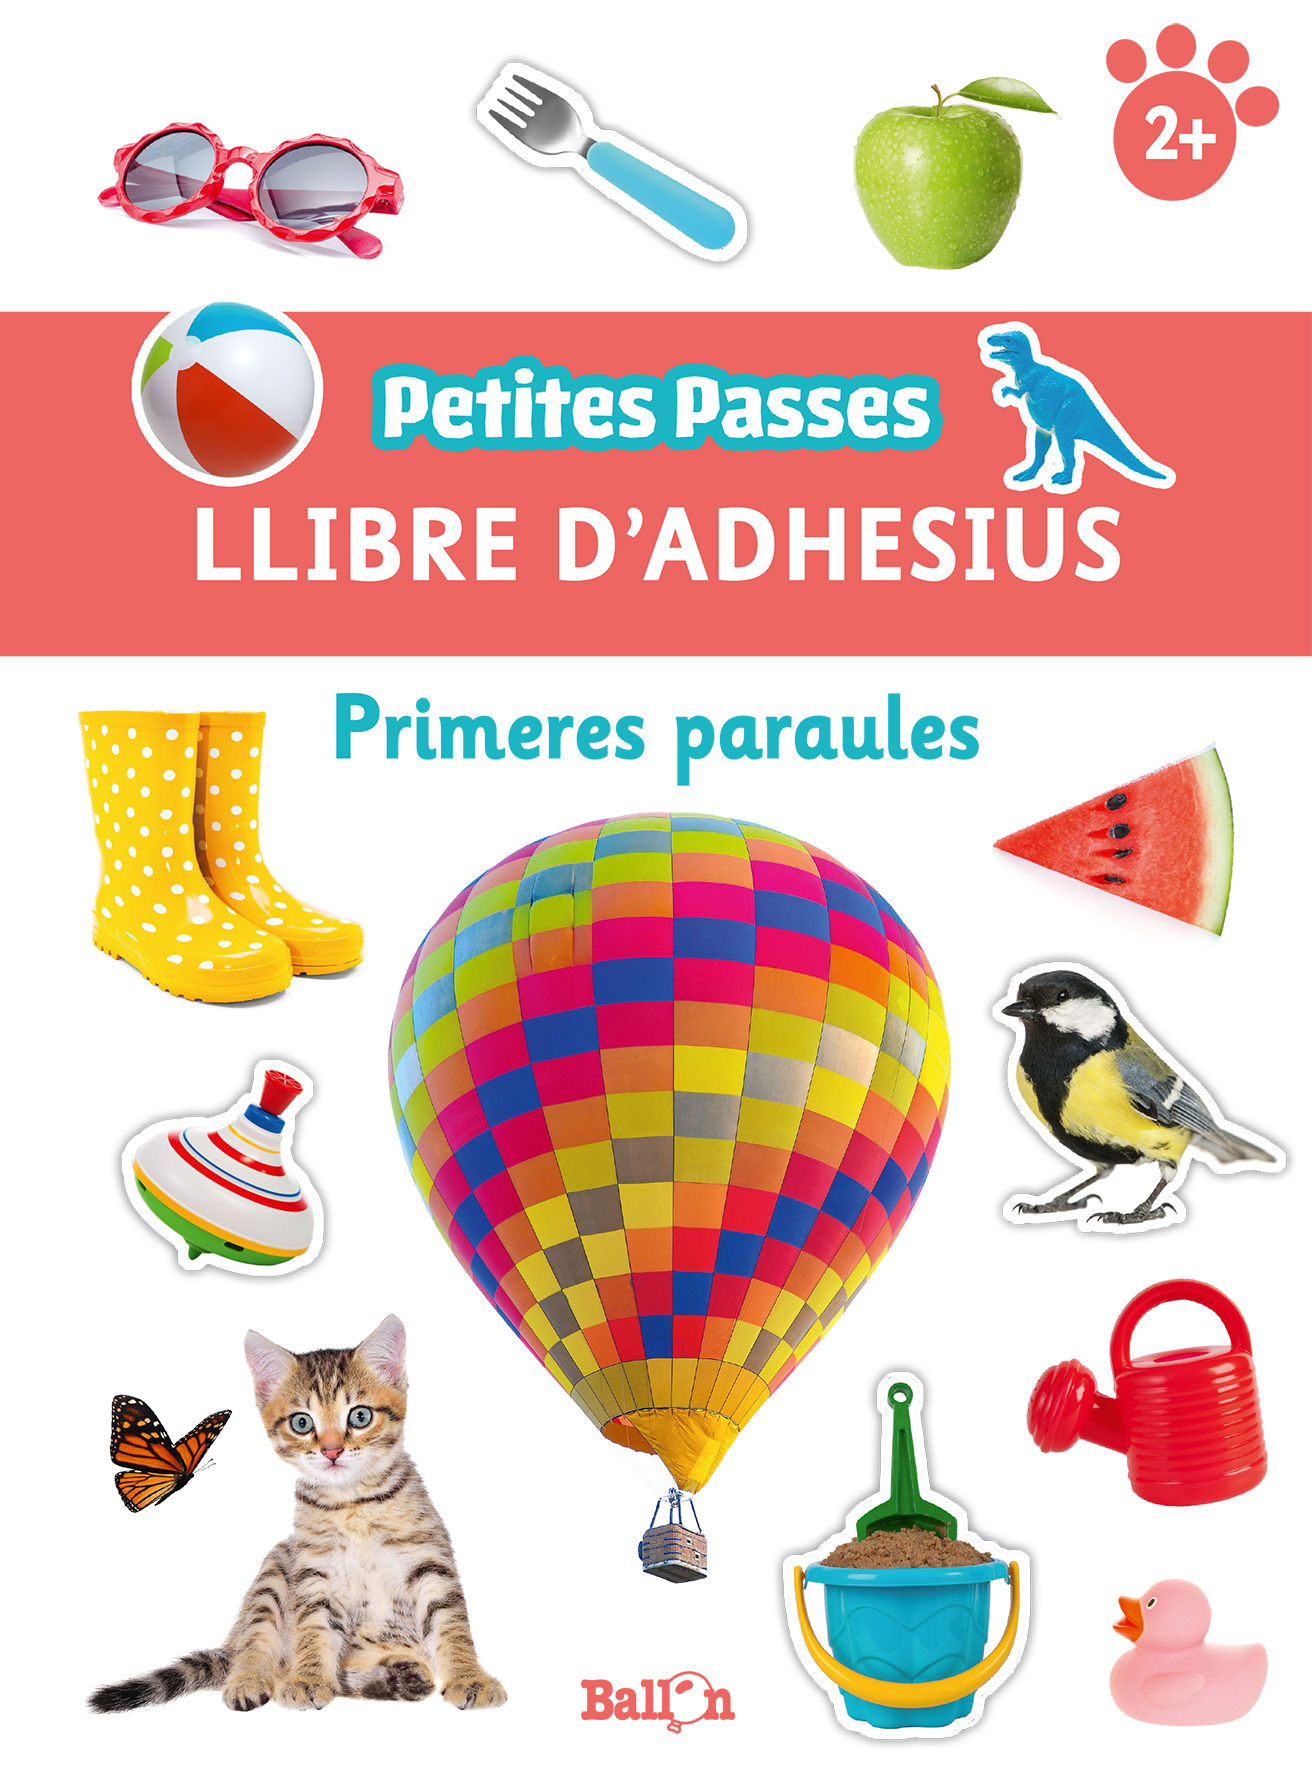 PETITES PASSES ADHESIUS PRIMERES PARAULES